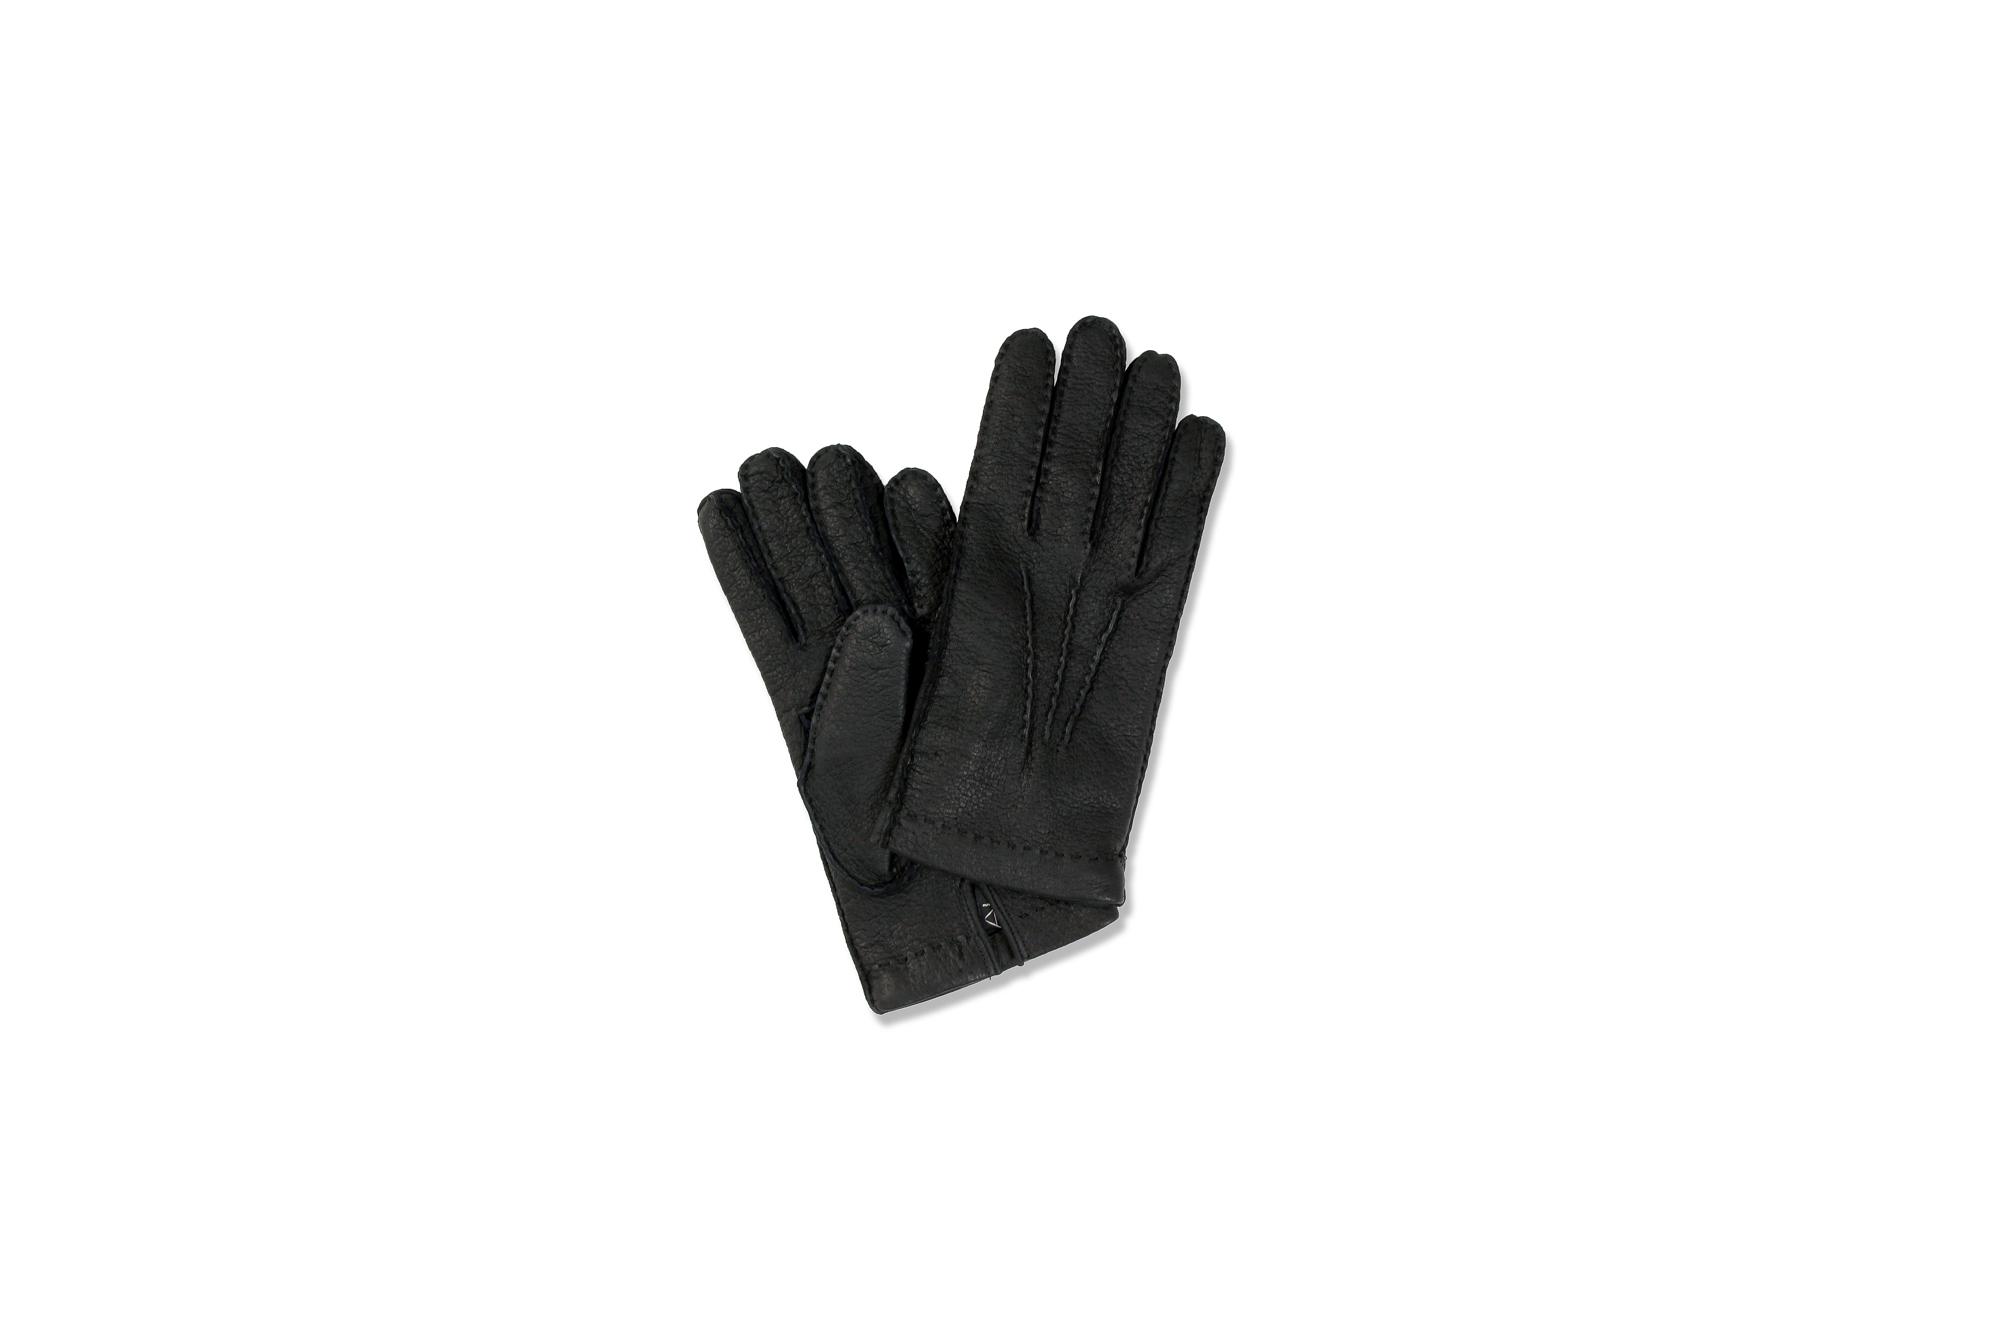 ALPO (アルポ) Peccary Cashmere Lining Gloves (ペッカリー カシミア ライニング グローブ) カシミア100% ライニング ペッカリー 手袋 グローブ NERO (ブラック) Made in italy (イタリア製) 2020 秋冬新作 愛知 名古屋 Alto e Diritto altoediritto アルトエデリット